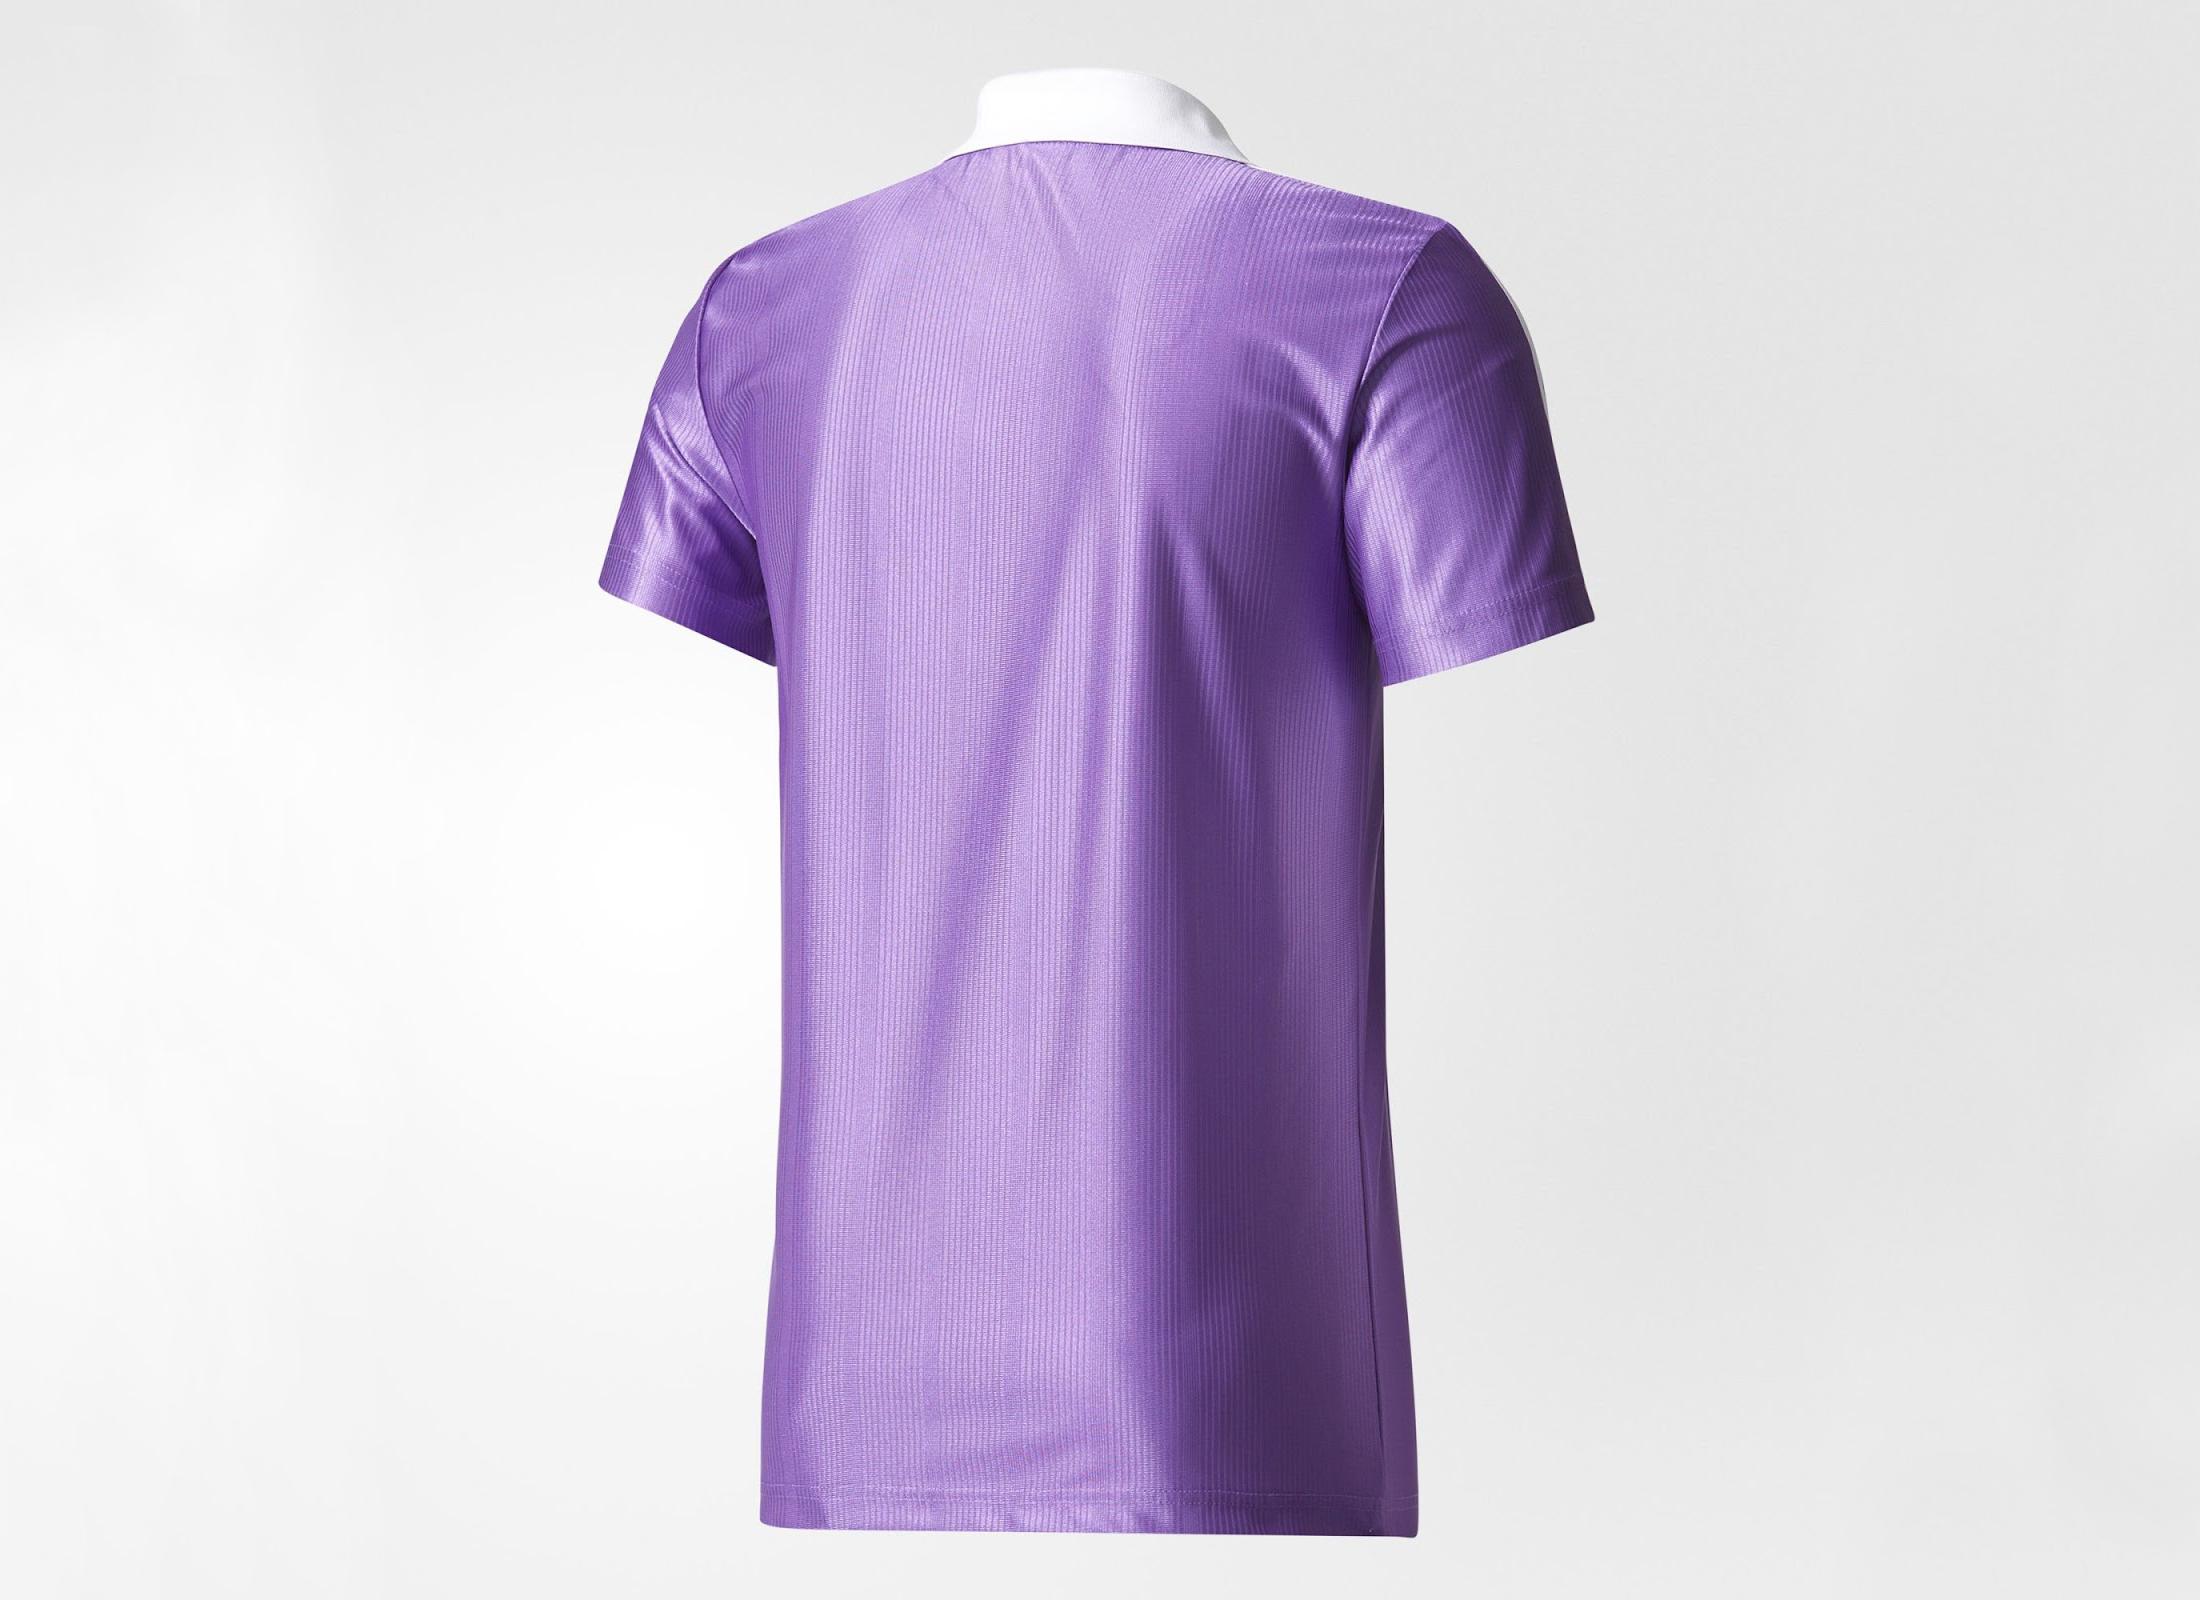 adidas-originals-real-madrid-2017-18-jersey (3)